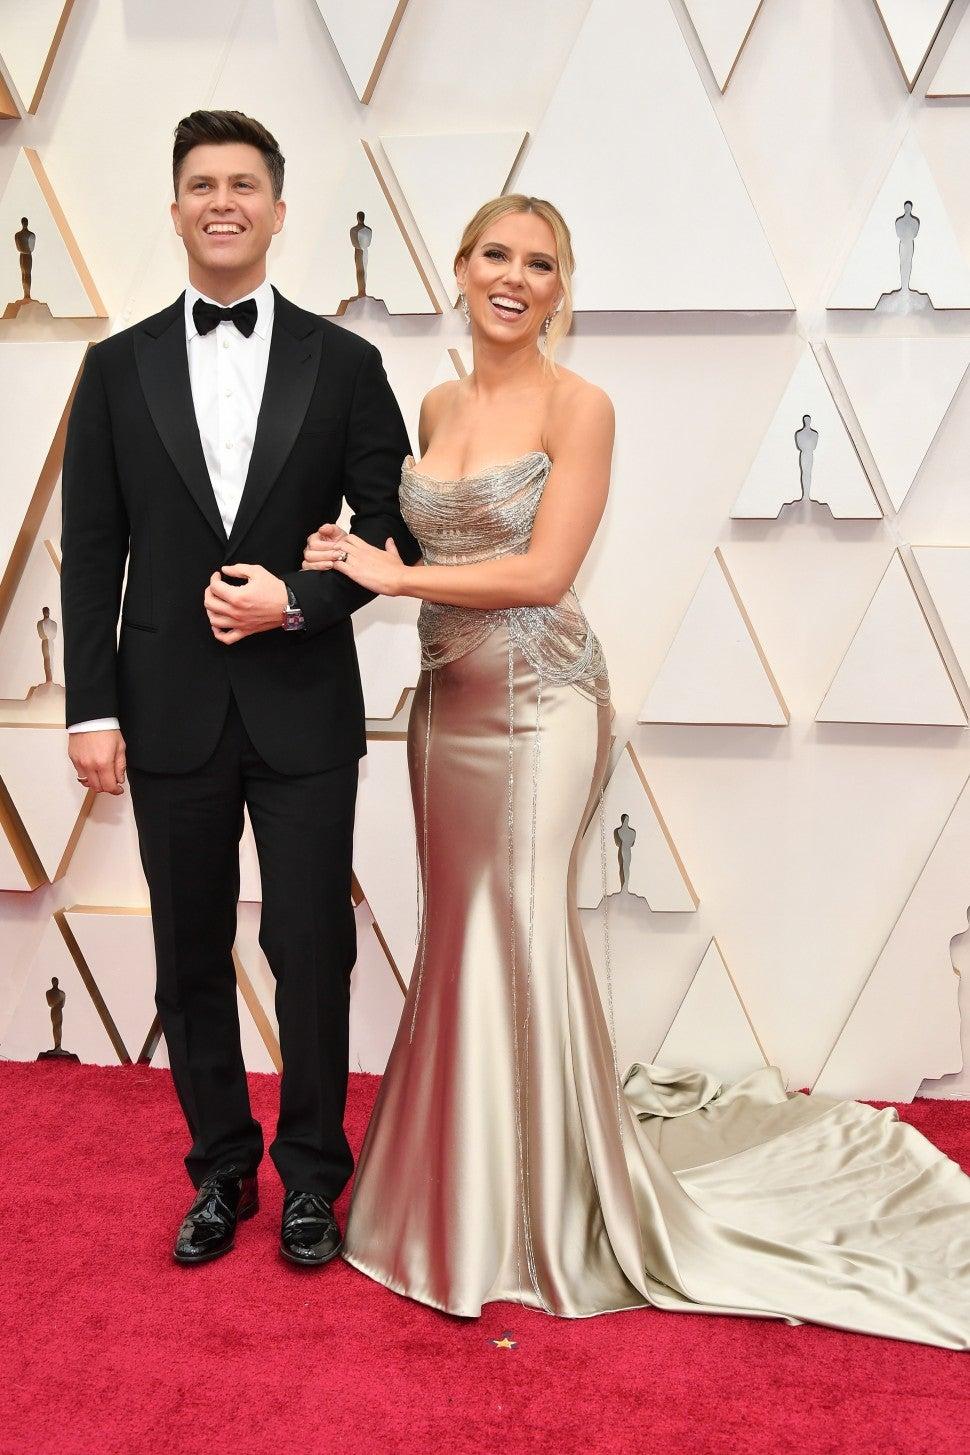 Scarlett Johansson and Colin Jost at 2020 Oscars